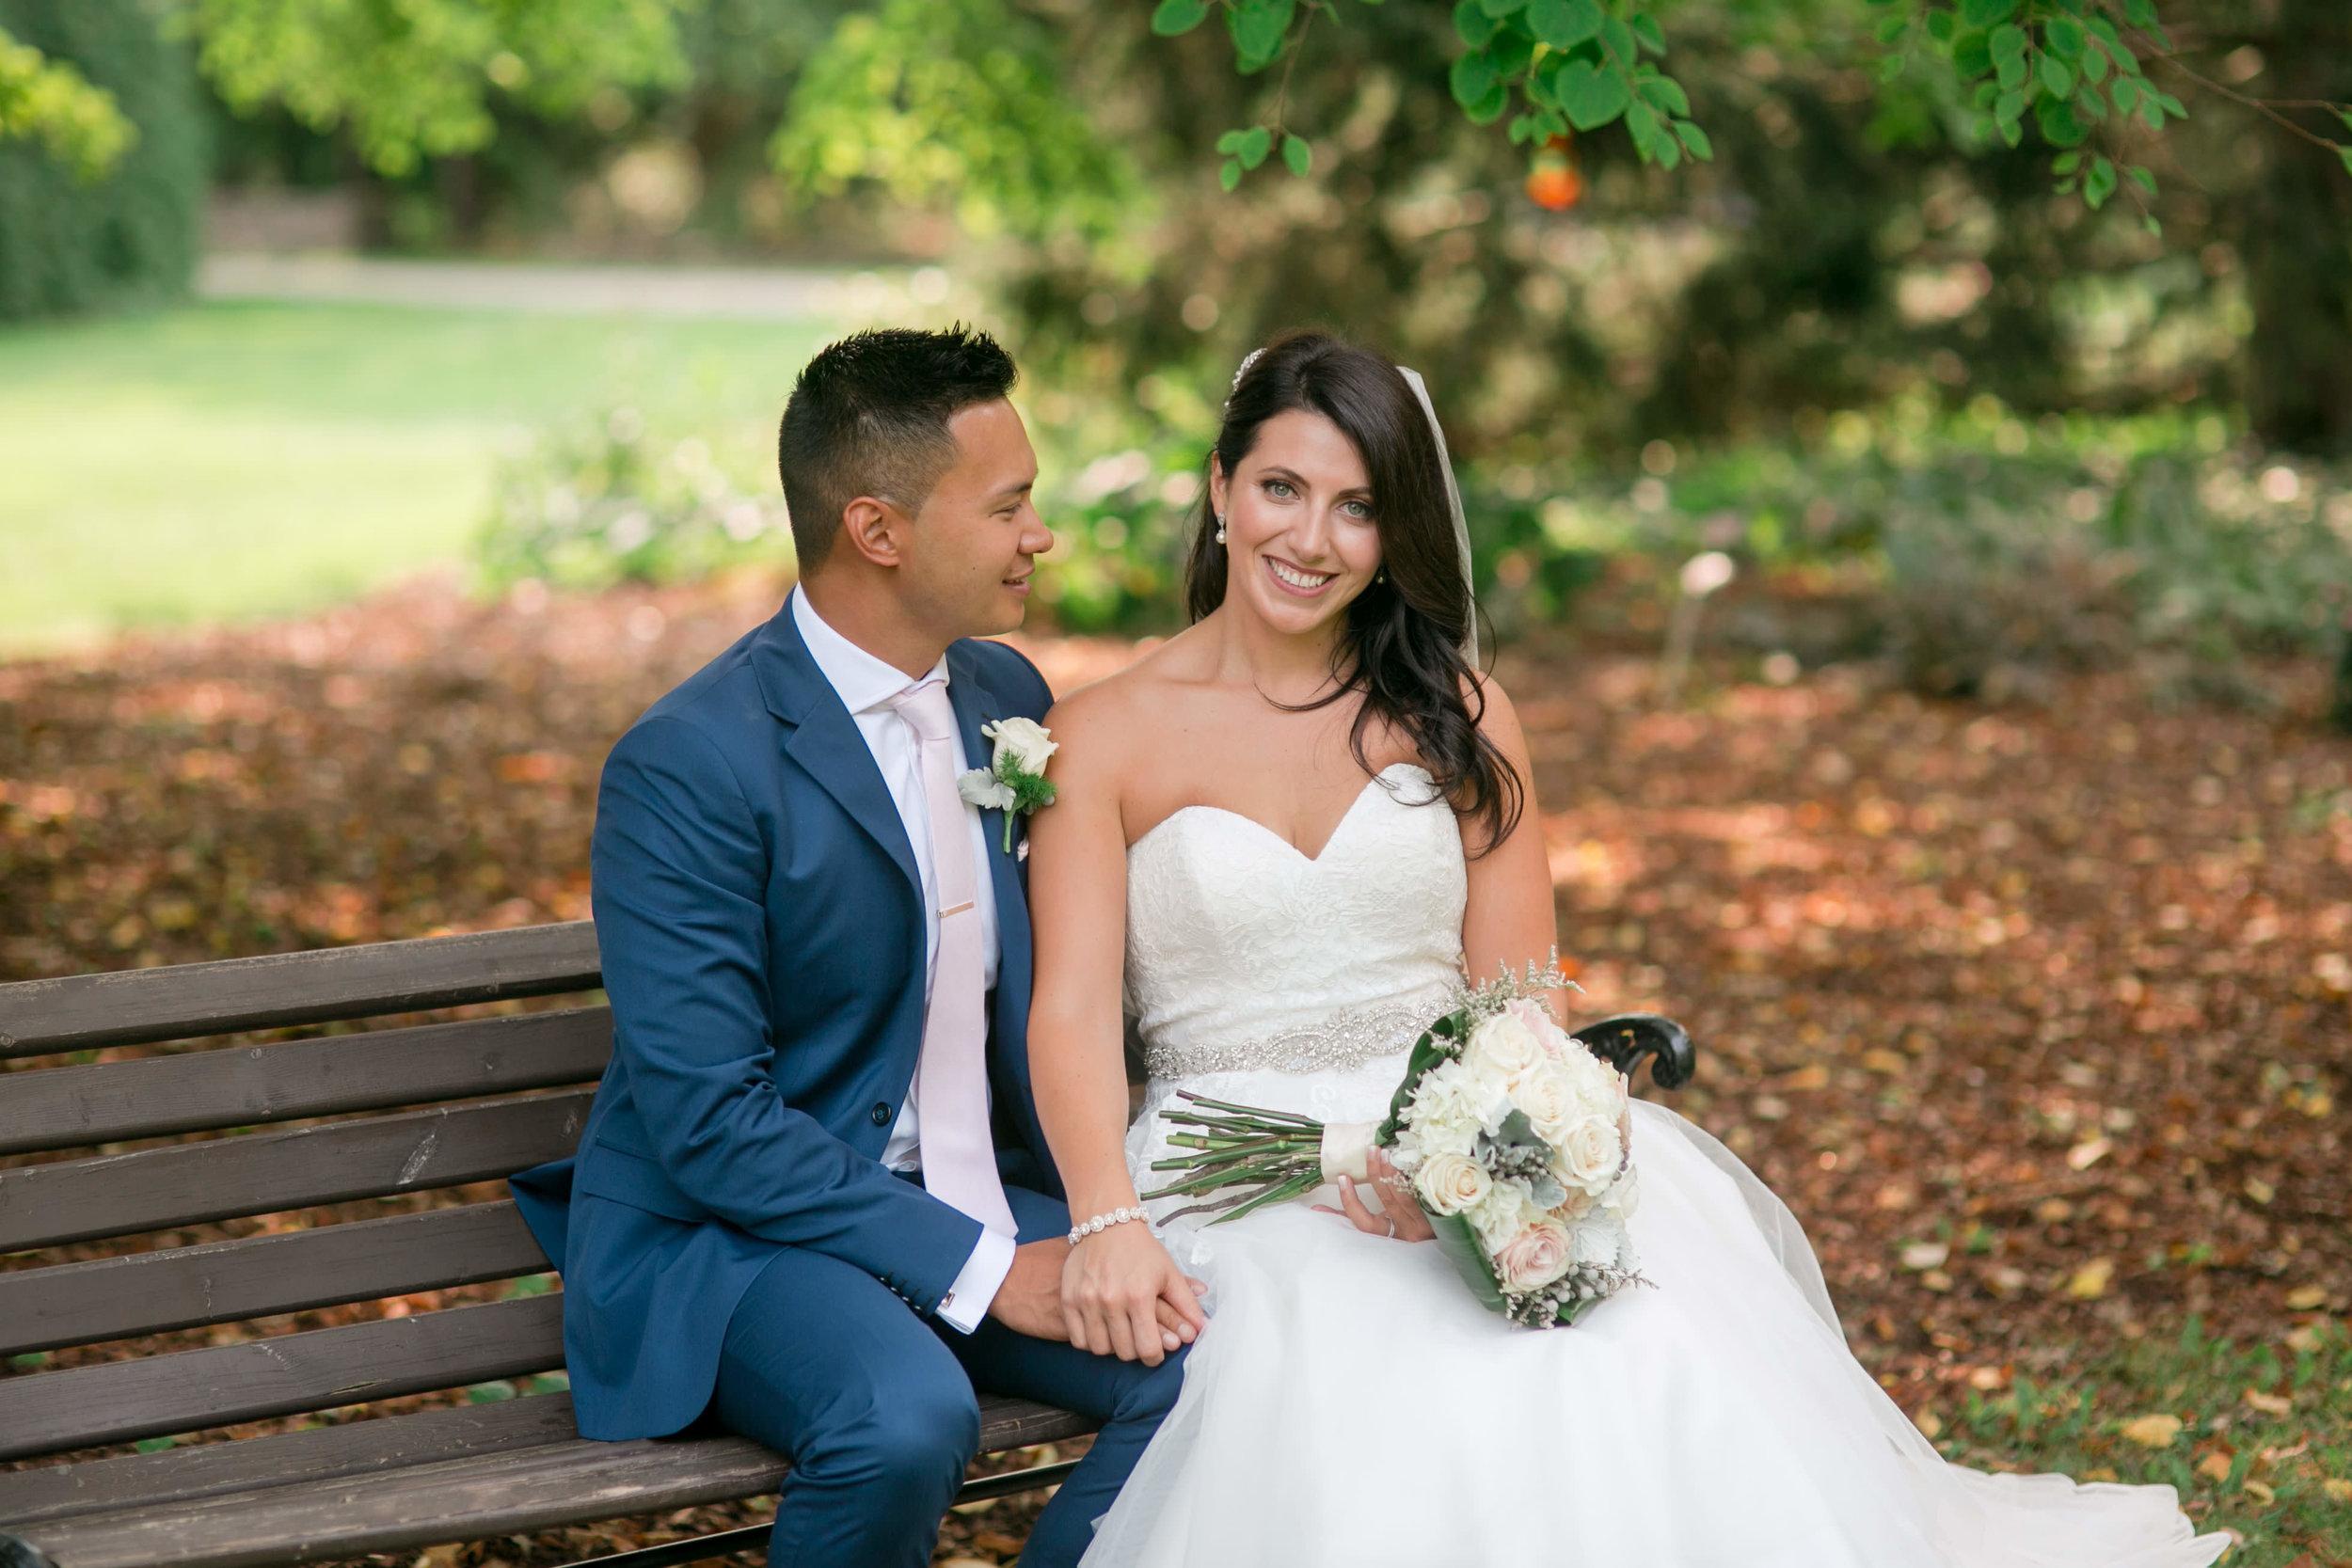 Stefanie___Bernard___Daniel_Ricci_Weddings_High_Res._Finals__336.jpg